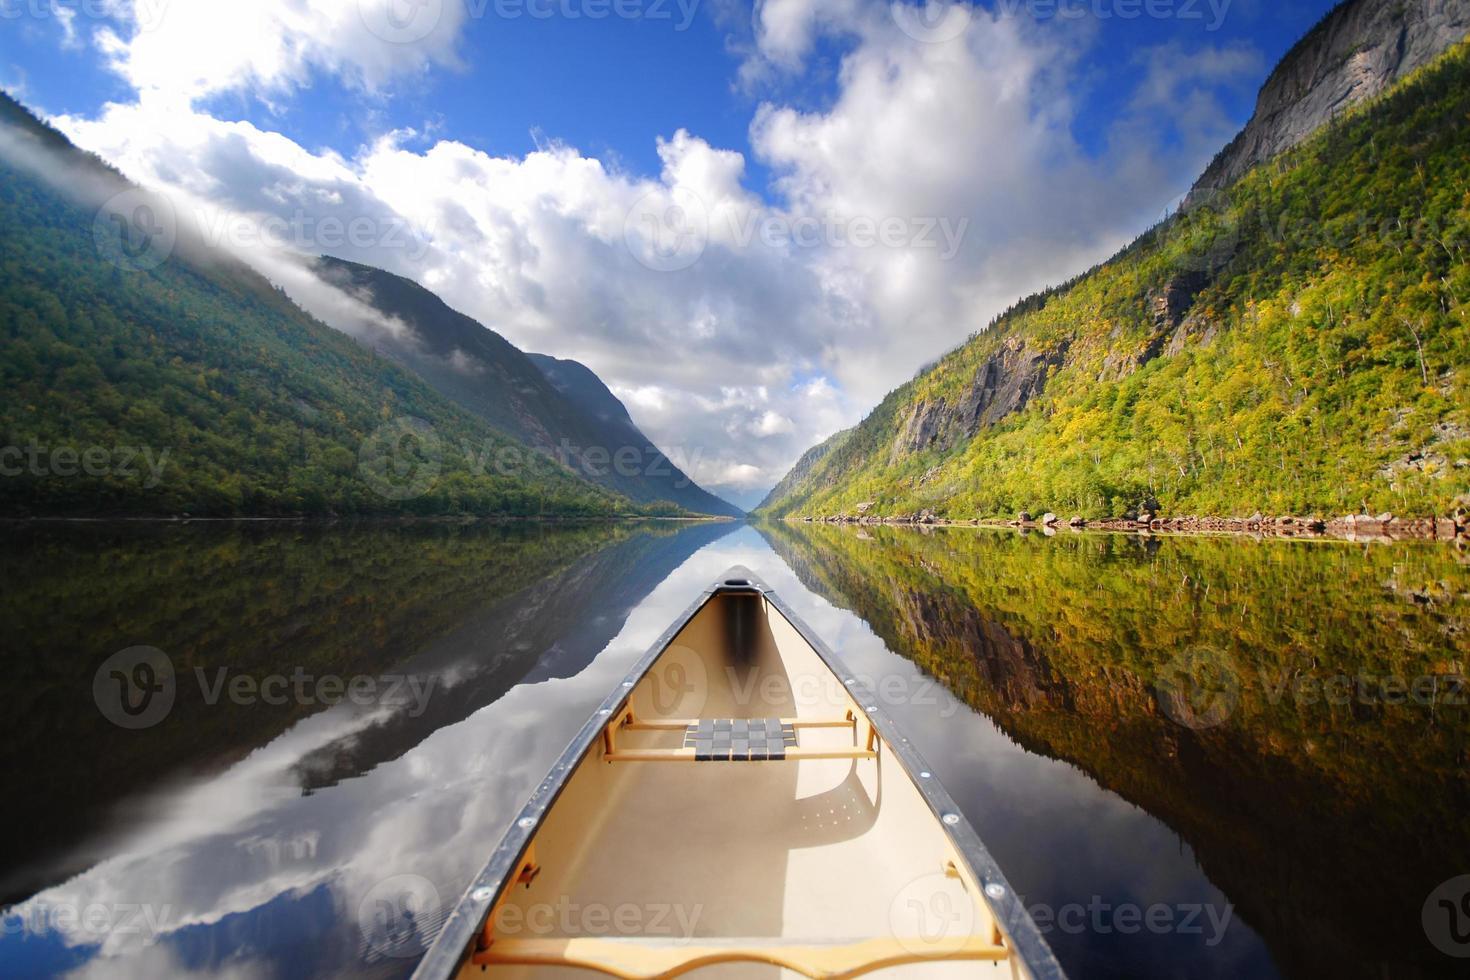 kanotur foto